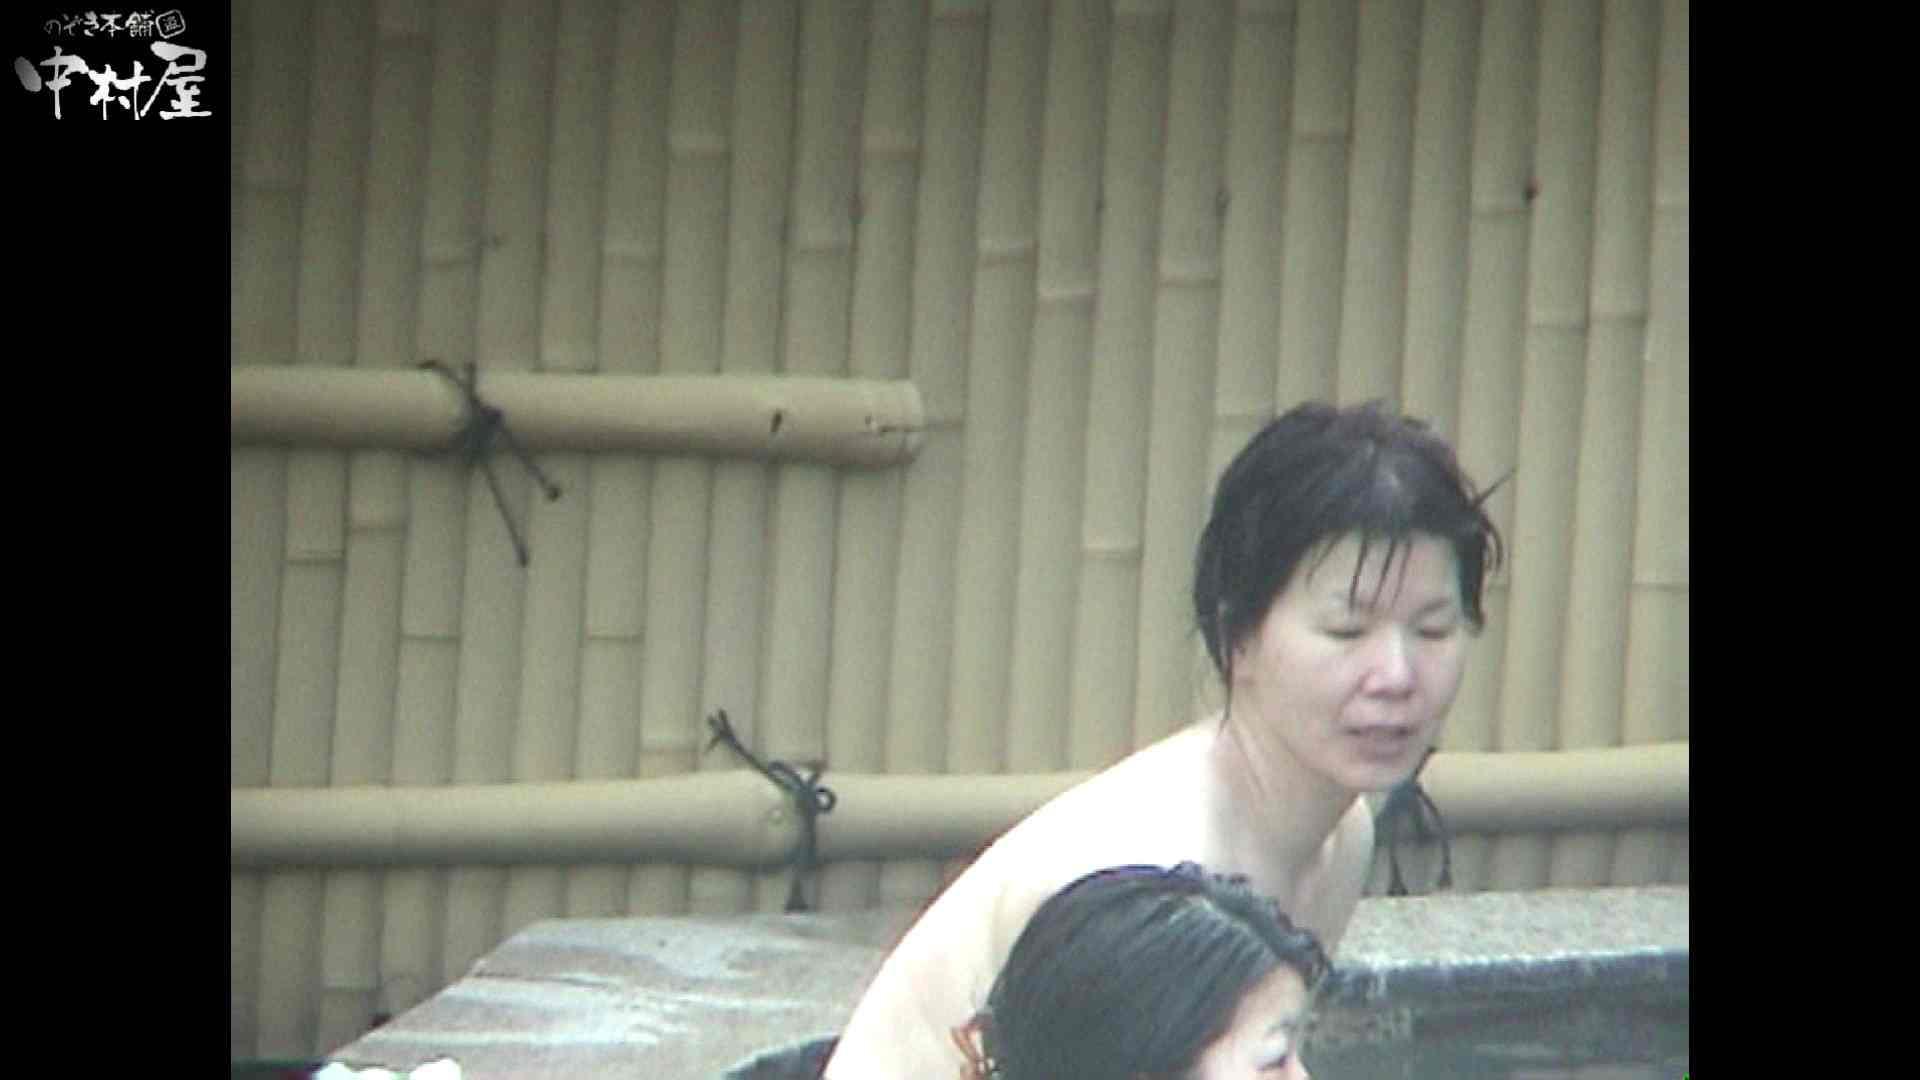 Aquaな露天風呂Vol.936 0  85連発 40